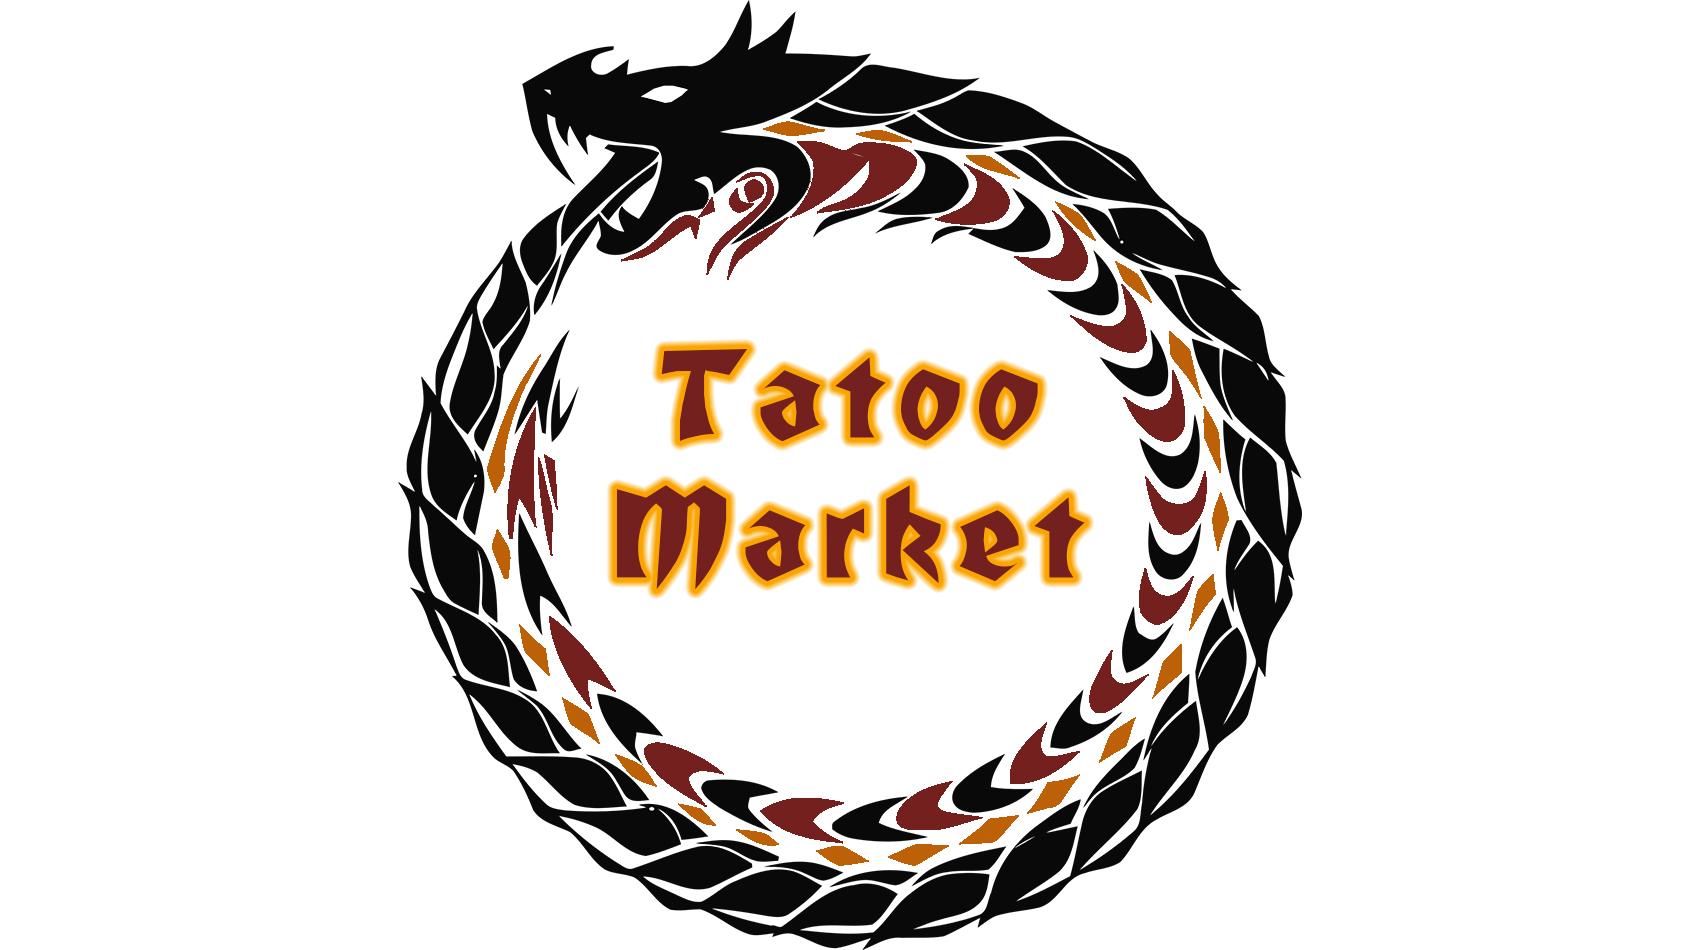 Редизайн логотипа магазина тату оборудования TattooMarket.ru фото f_9105c3d77cf82f26.jpg